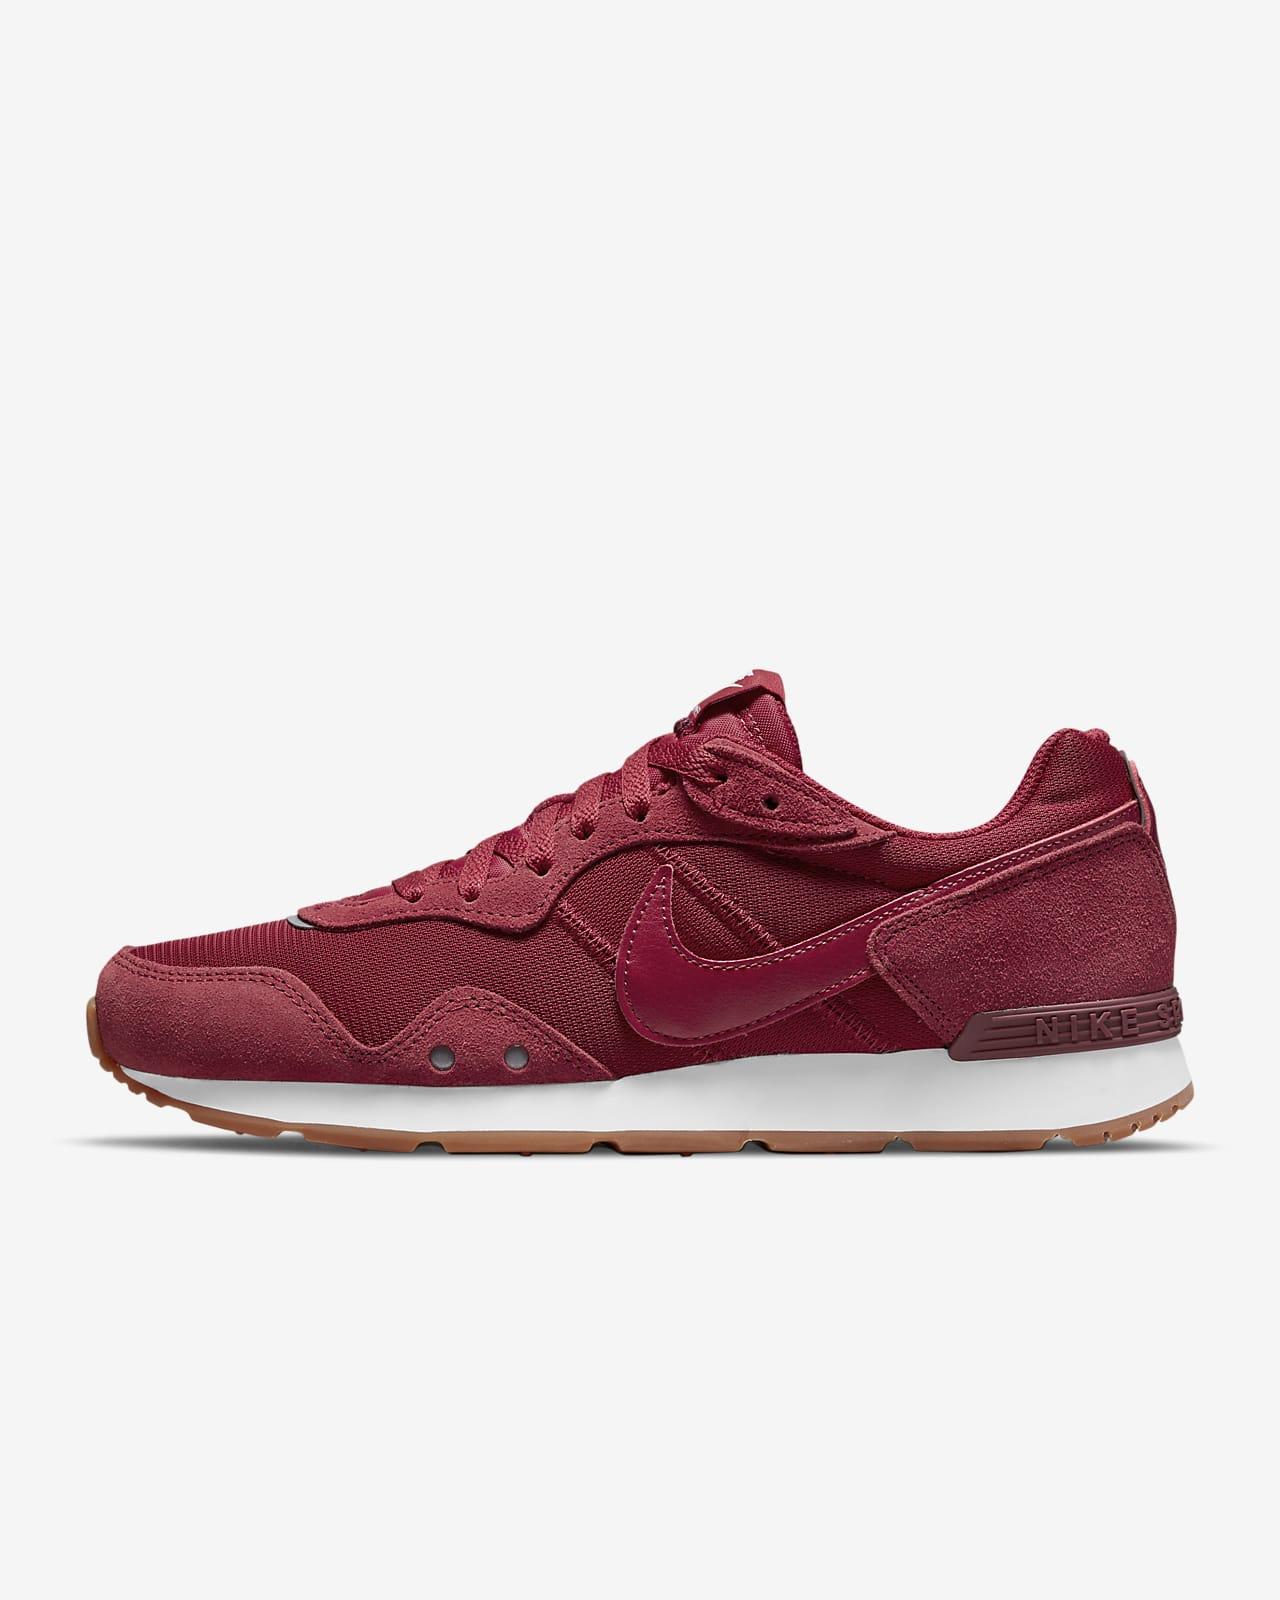 Nike Venture Runner Women's Shoes